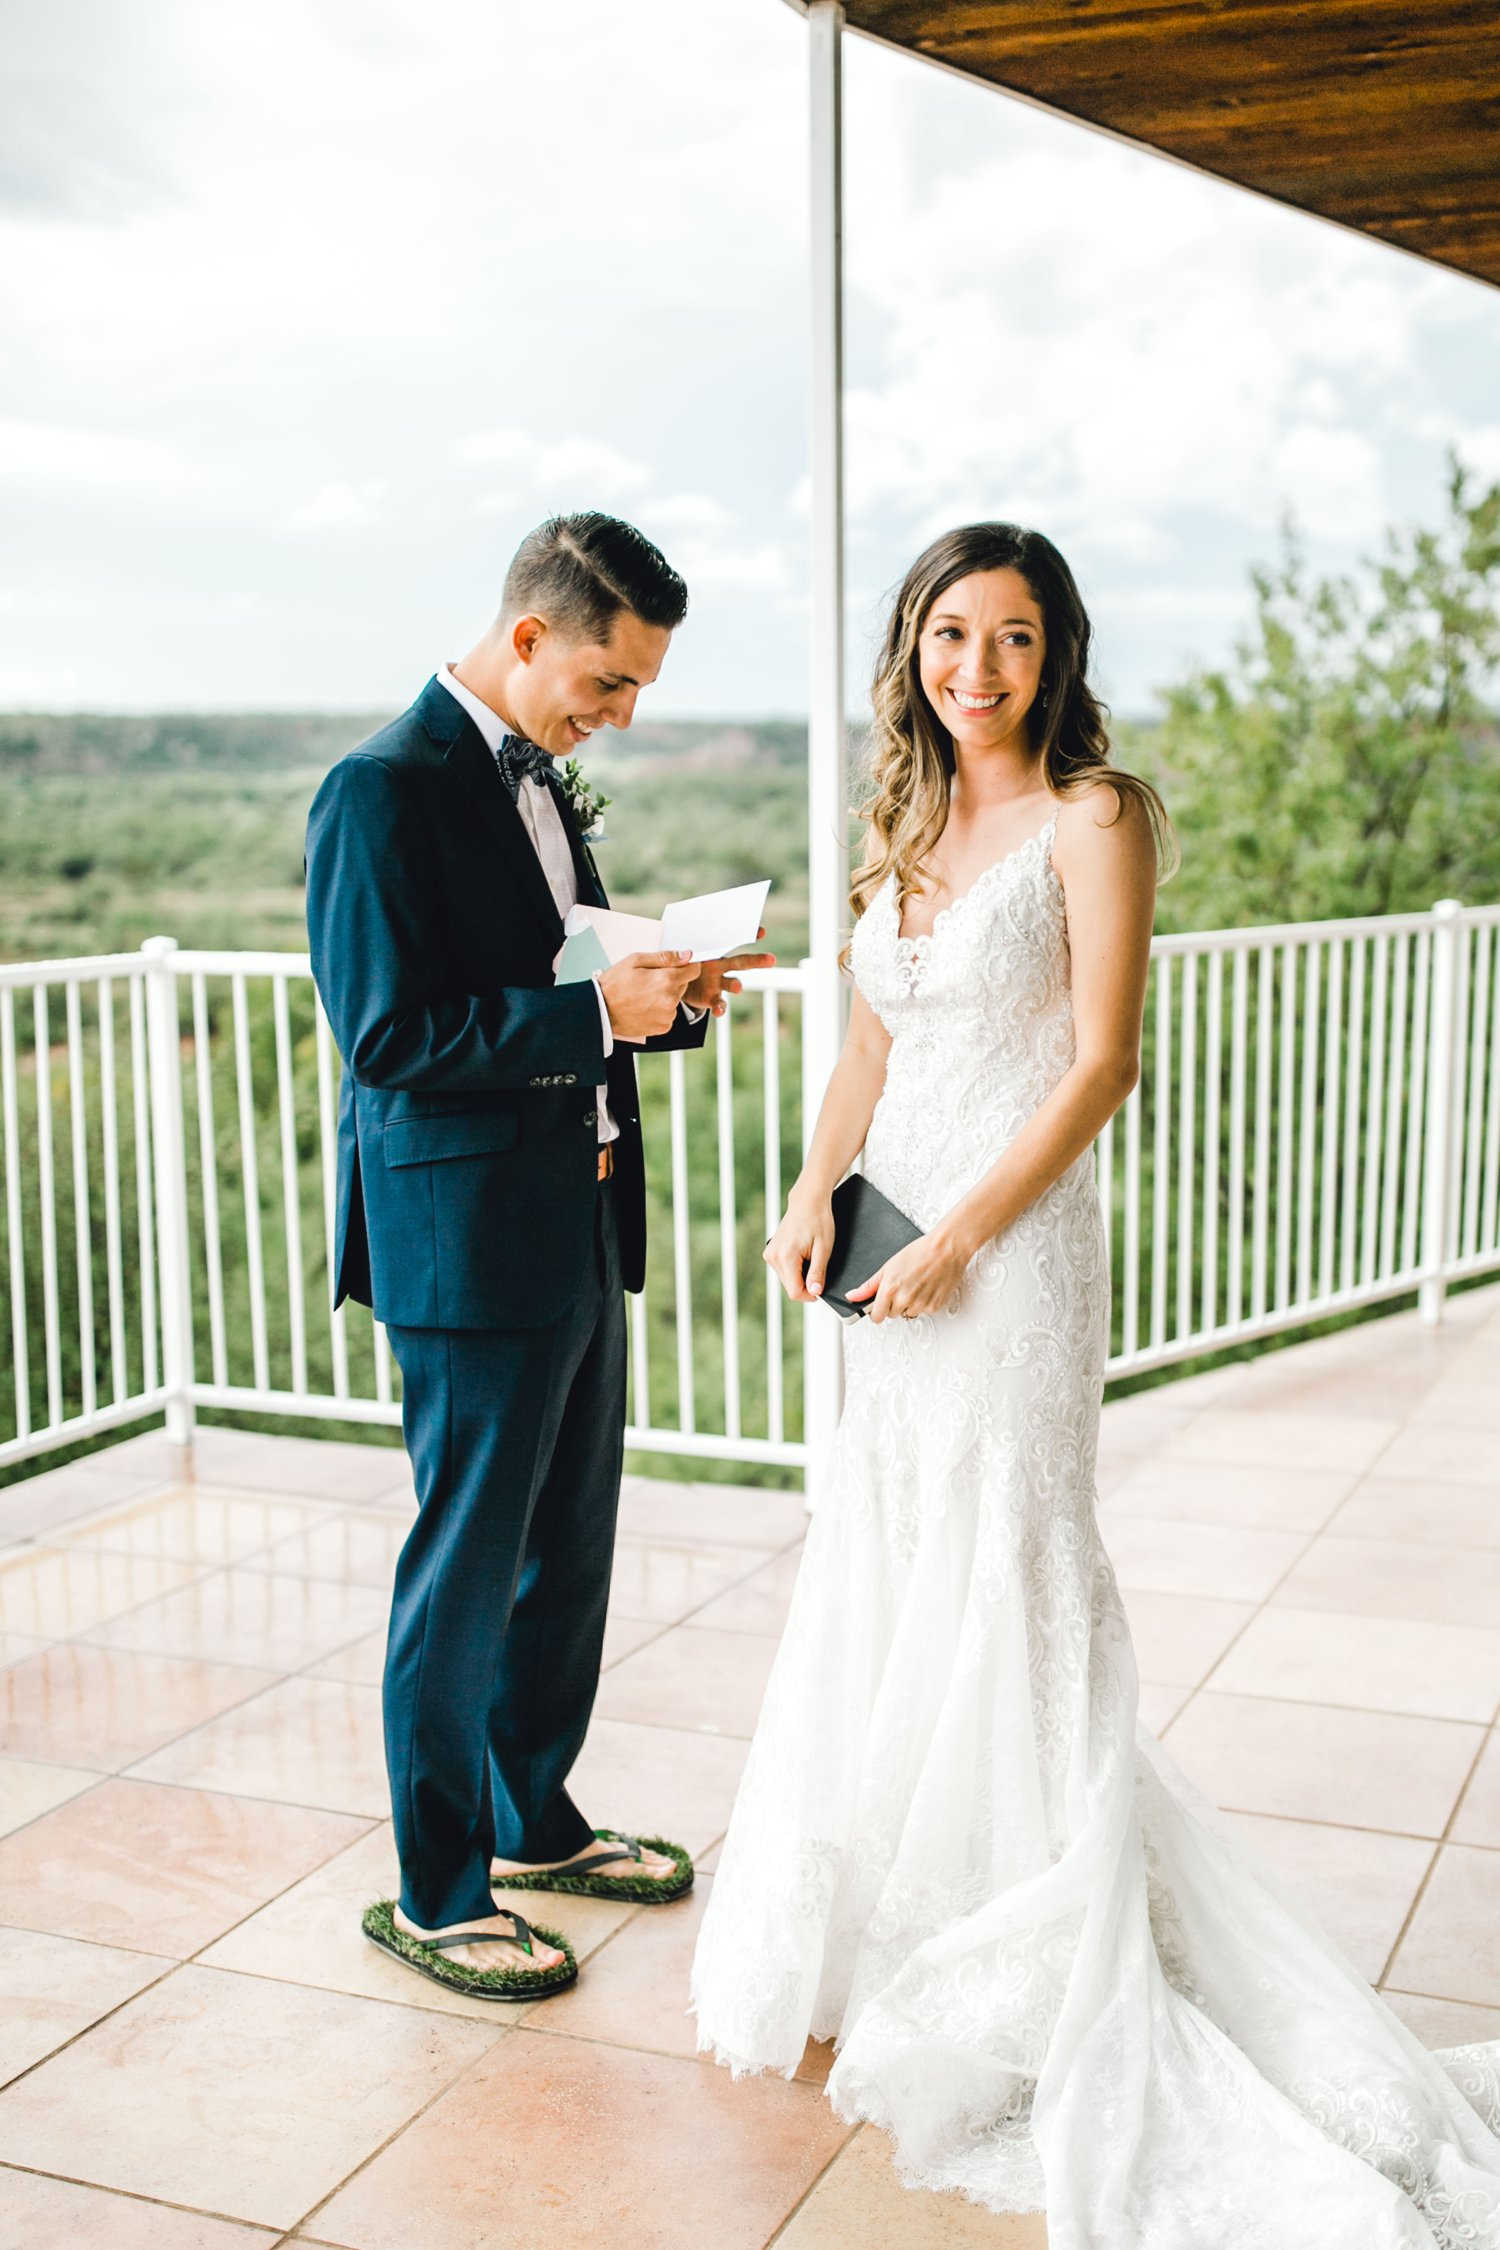 Ashley_John_English_Elegant_Texas_Wedding_Outdoors_Ranch_Caprock_Winery_ALLEEJ_0032.jpg